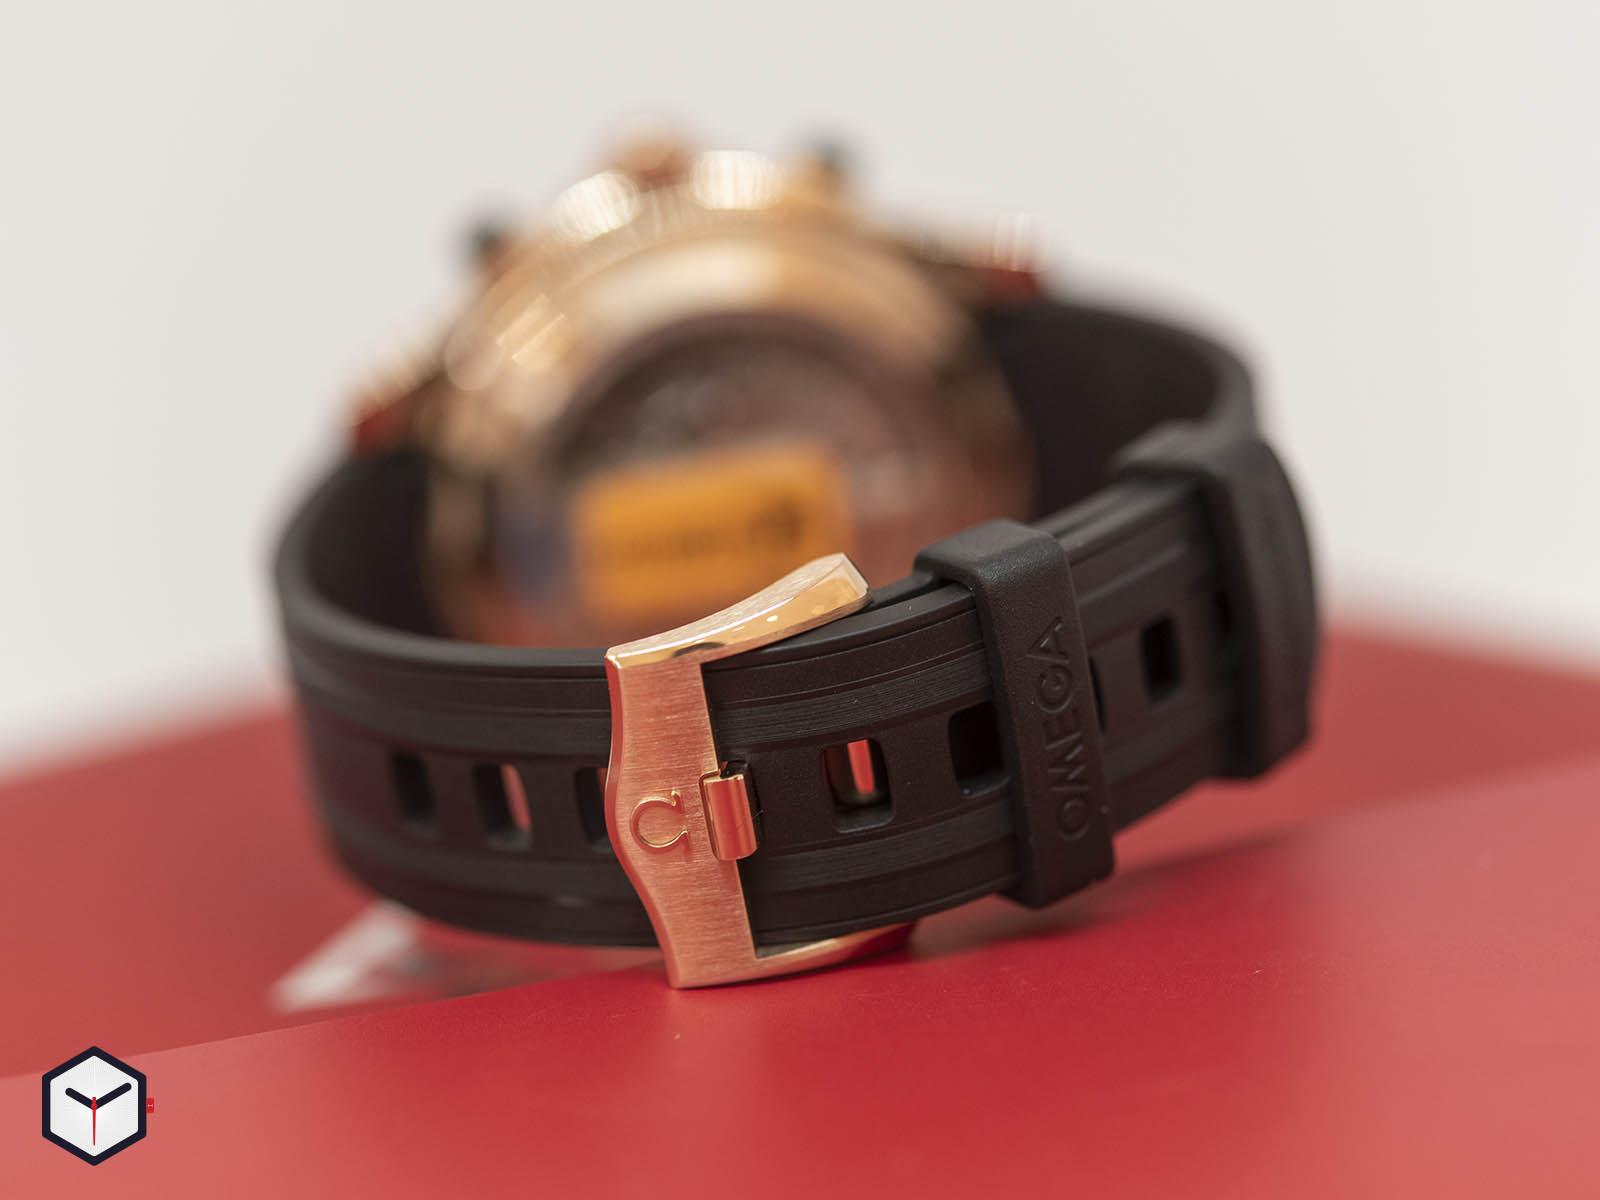 210-62-44-51-01-001-omega-seamaster-diver-300m-co-axial-master-chronometer-chronograph-6.jpg